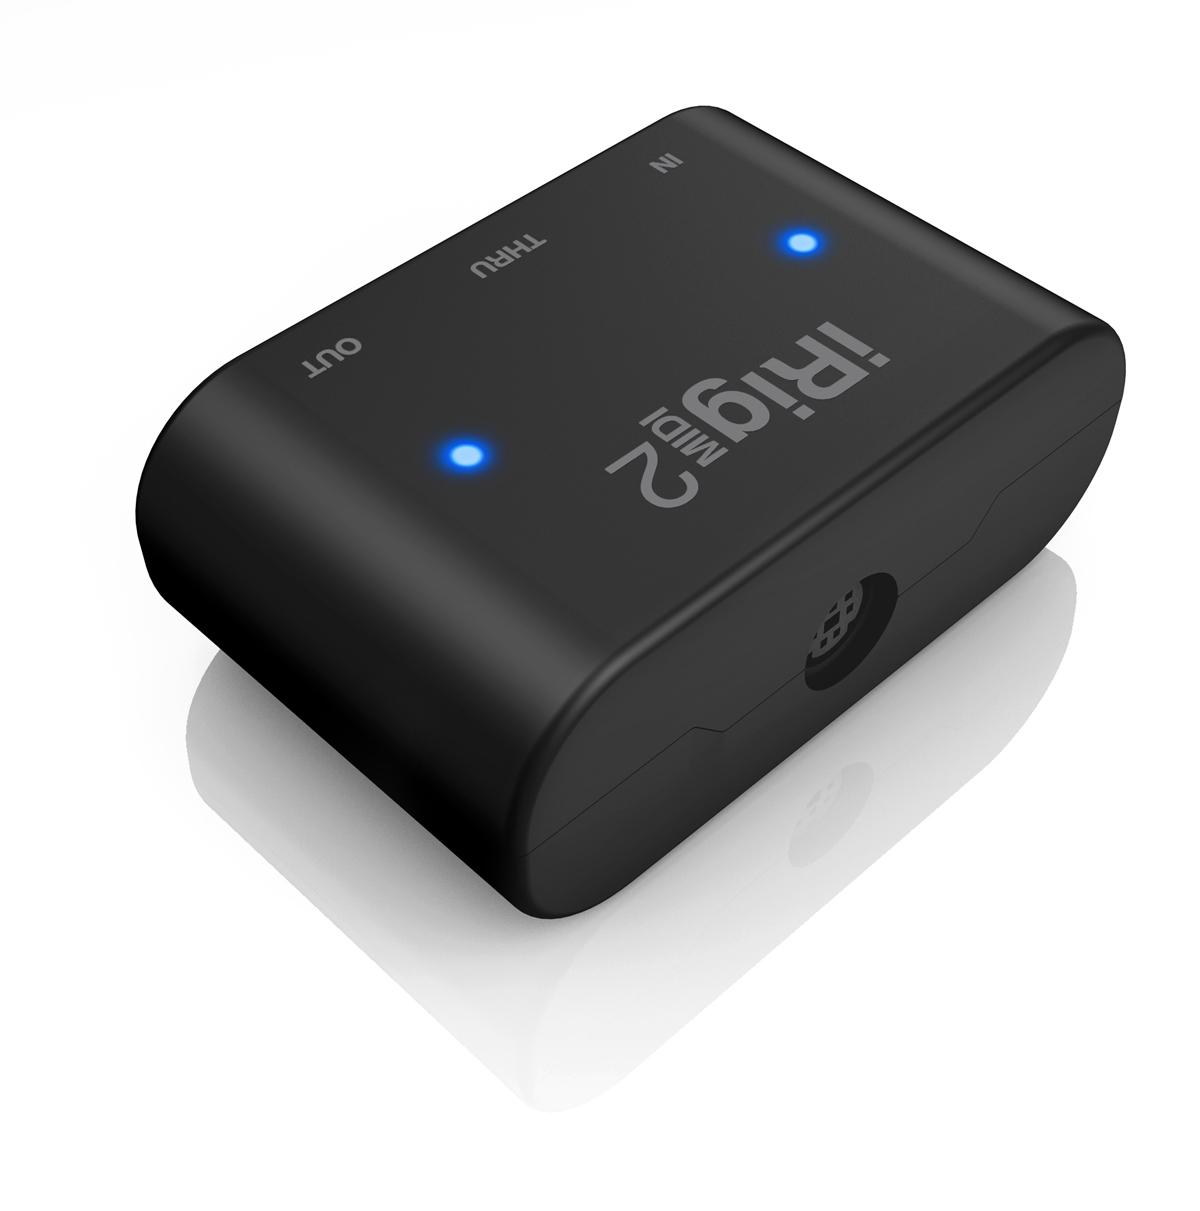 IK Multimedia IRIG-MIDI-2 Lightning/USB MIDI interface for iPhone, iPad and Mac/PC IRIG-MIDI-2